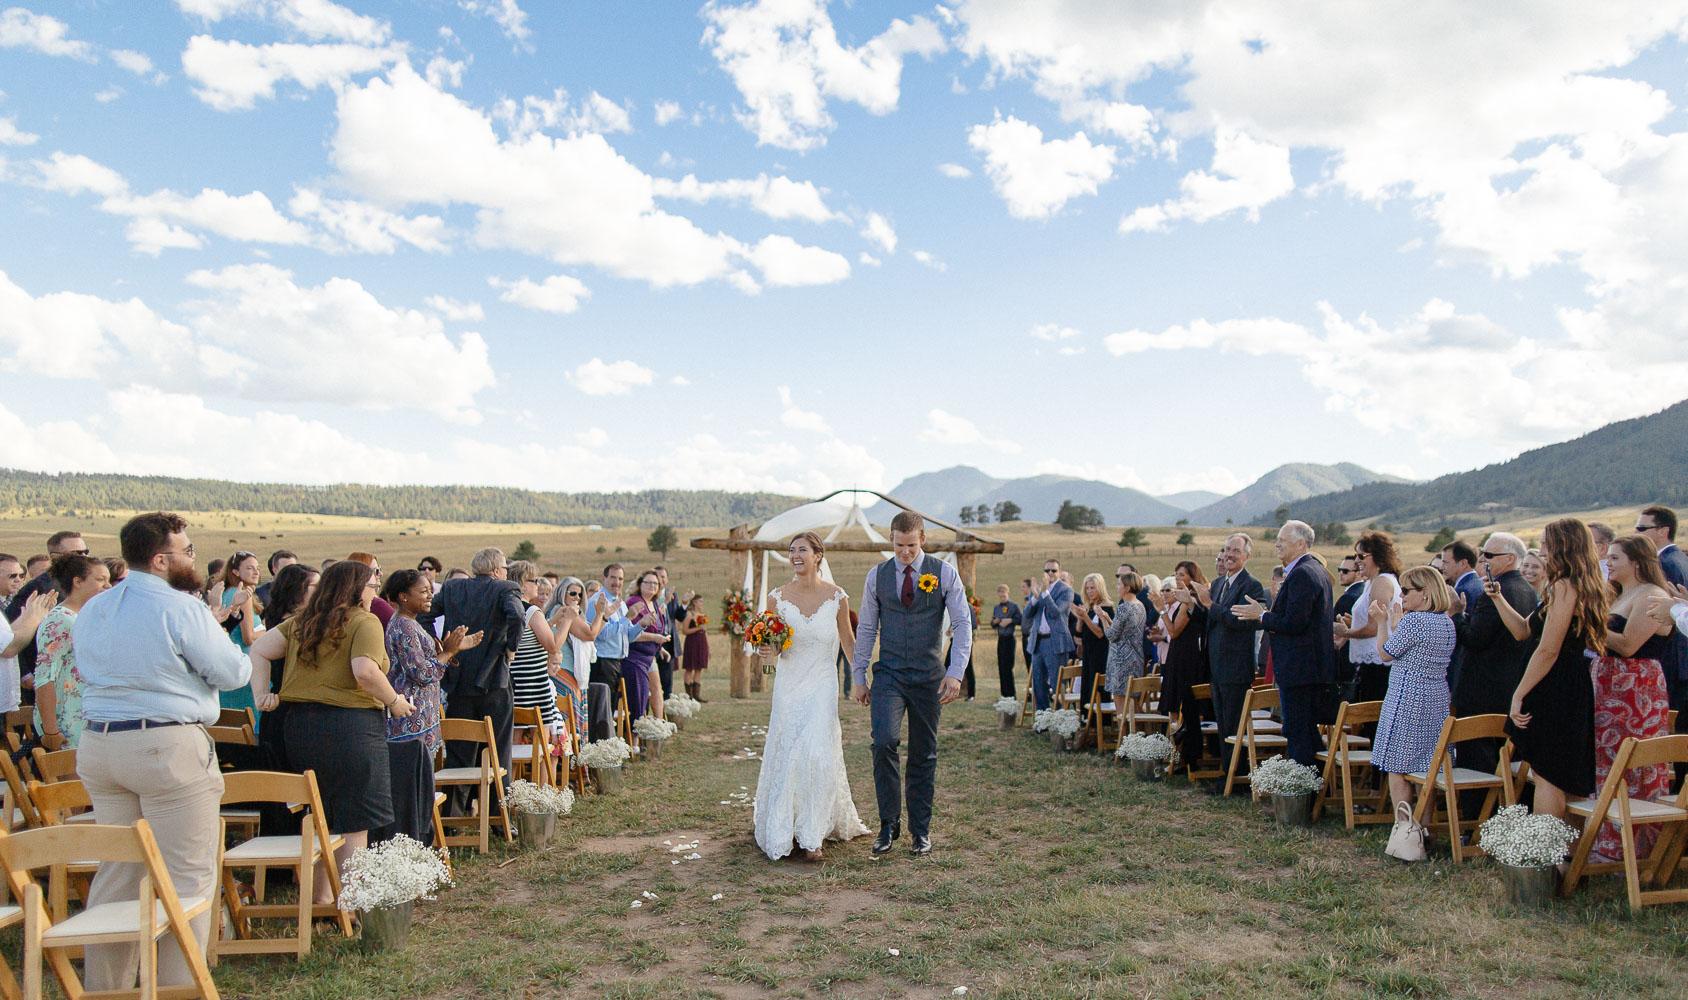 160902-Luxium-Weddings-Arizona-Michael-Becca-Spruce-Mountain-Ranch-Colorado-webres-069.jpg